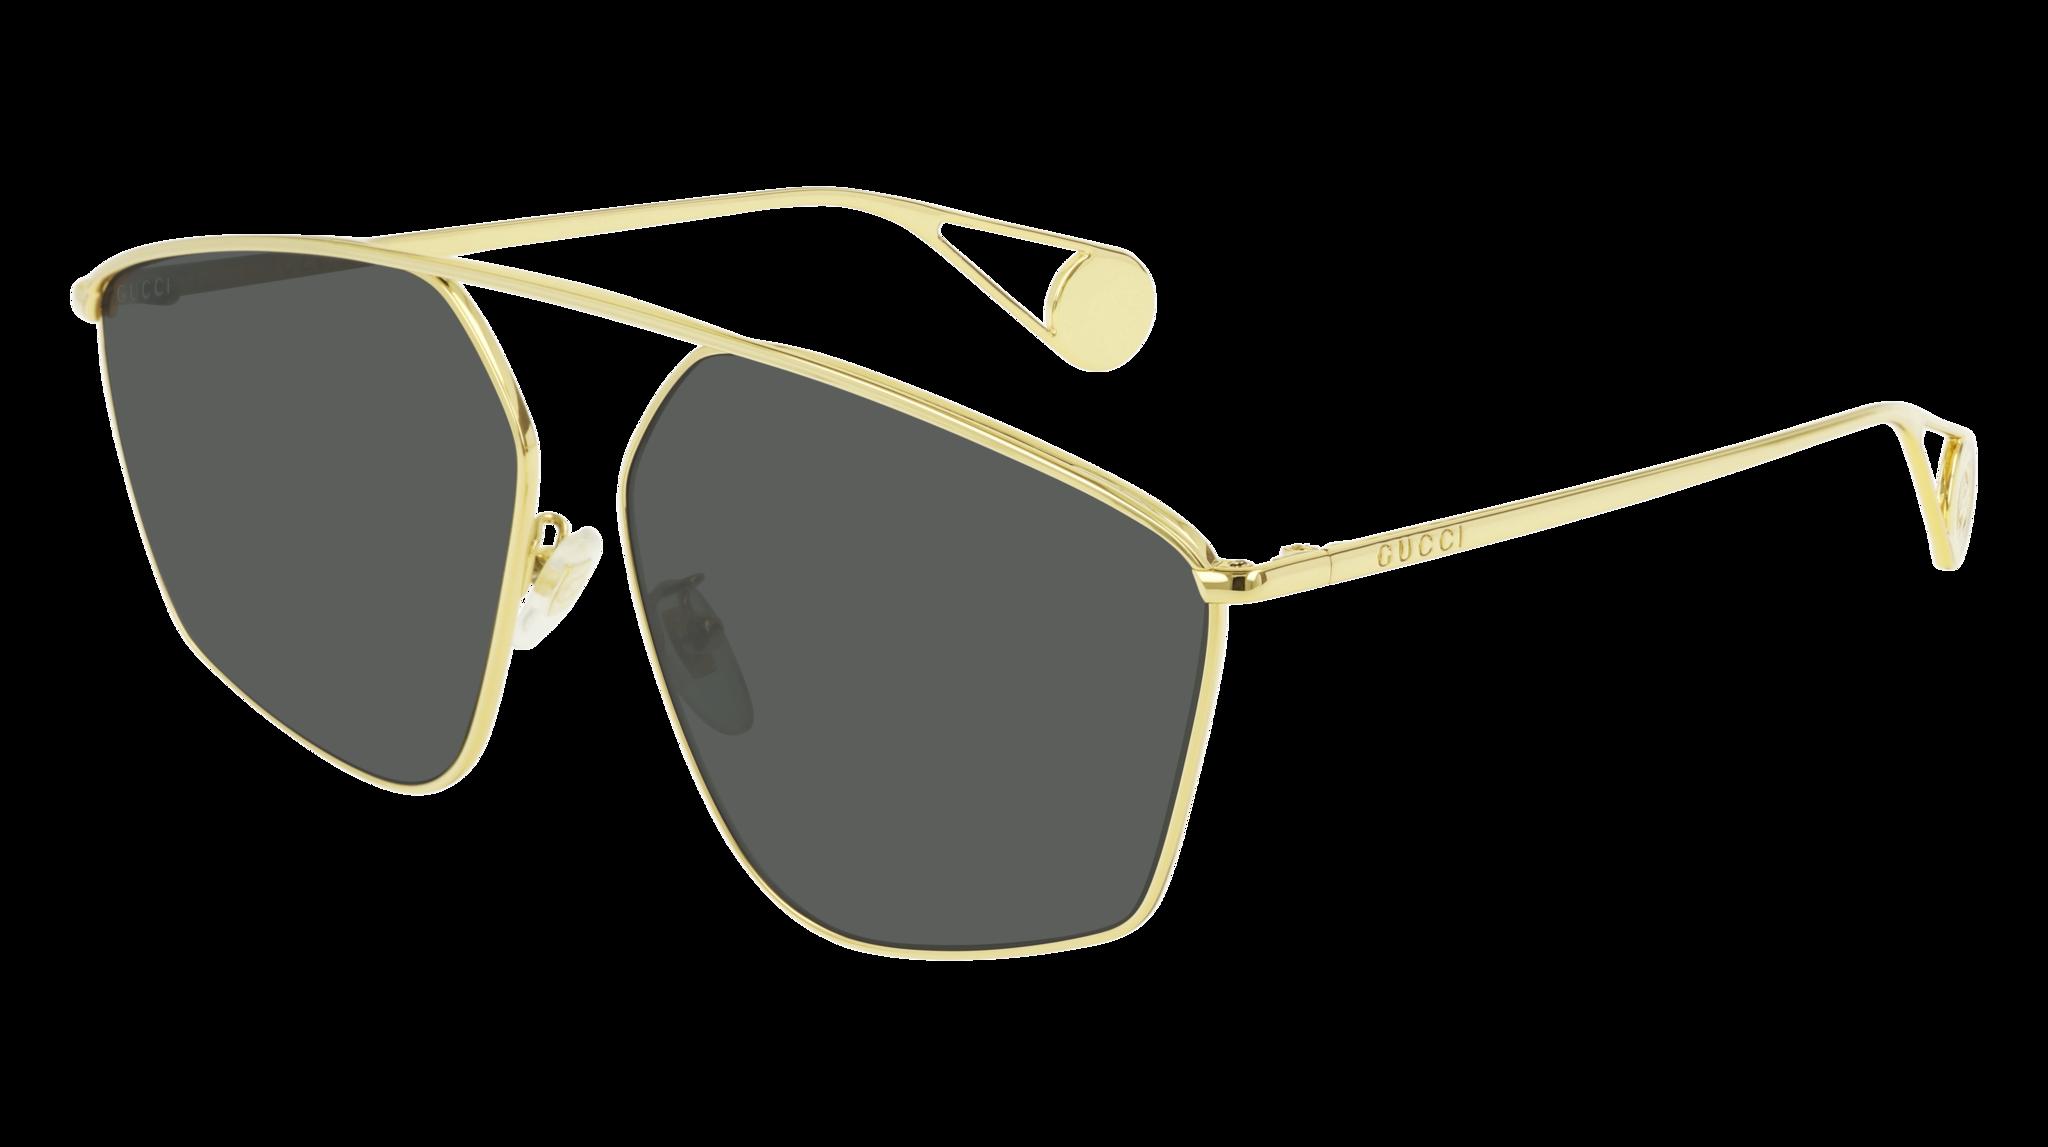 Gucci - GG0437SA - 2-1